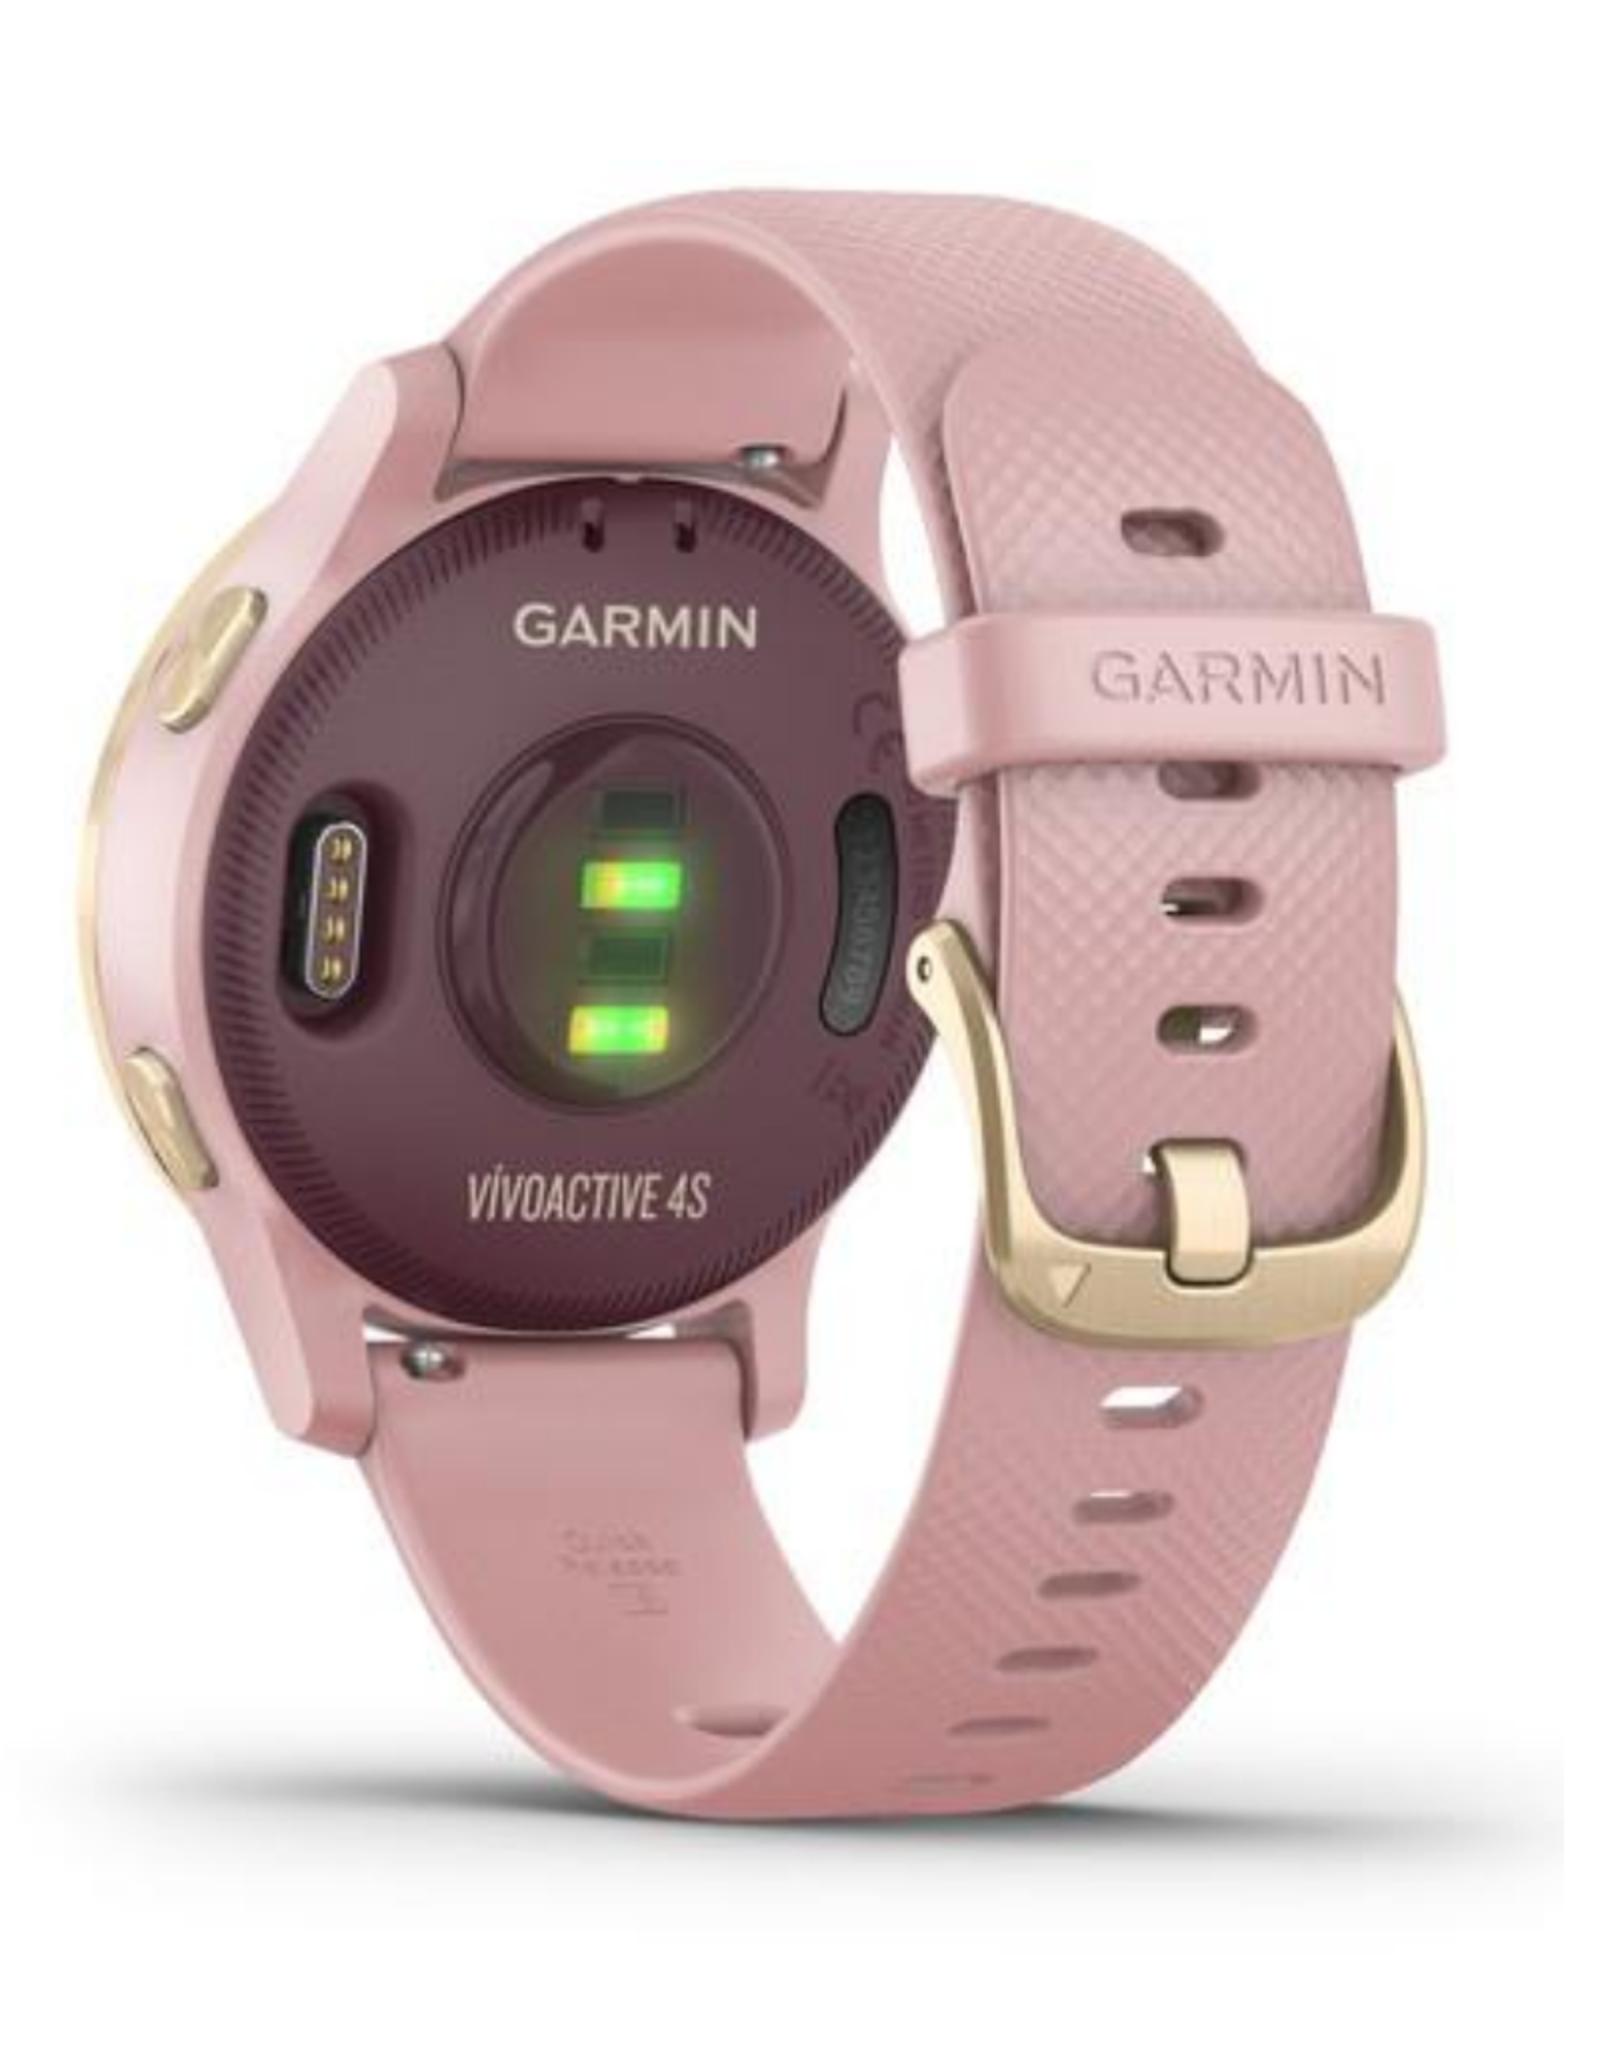 GARMIN GARMIN VIVOACTIVE 4S LT GLD STAINLESS  STEEL BEZEL W DUST ROSE SILICONE BAND